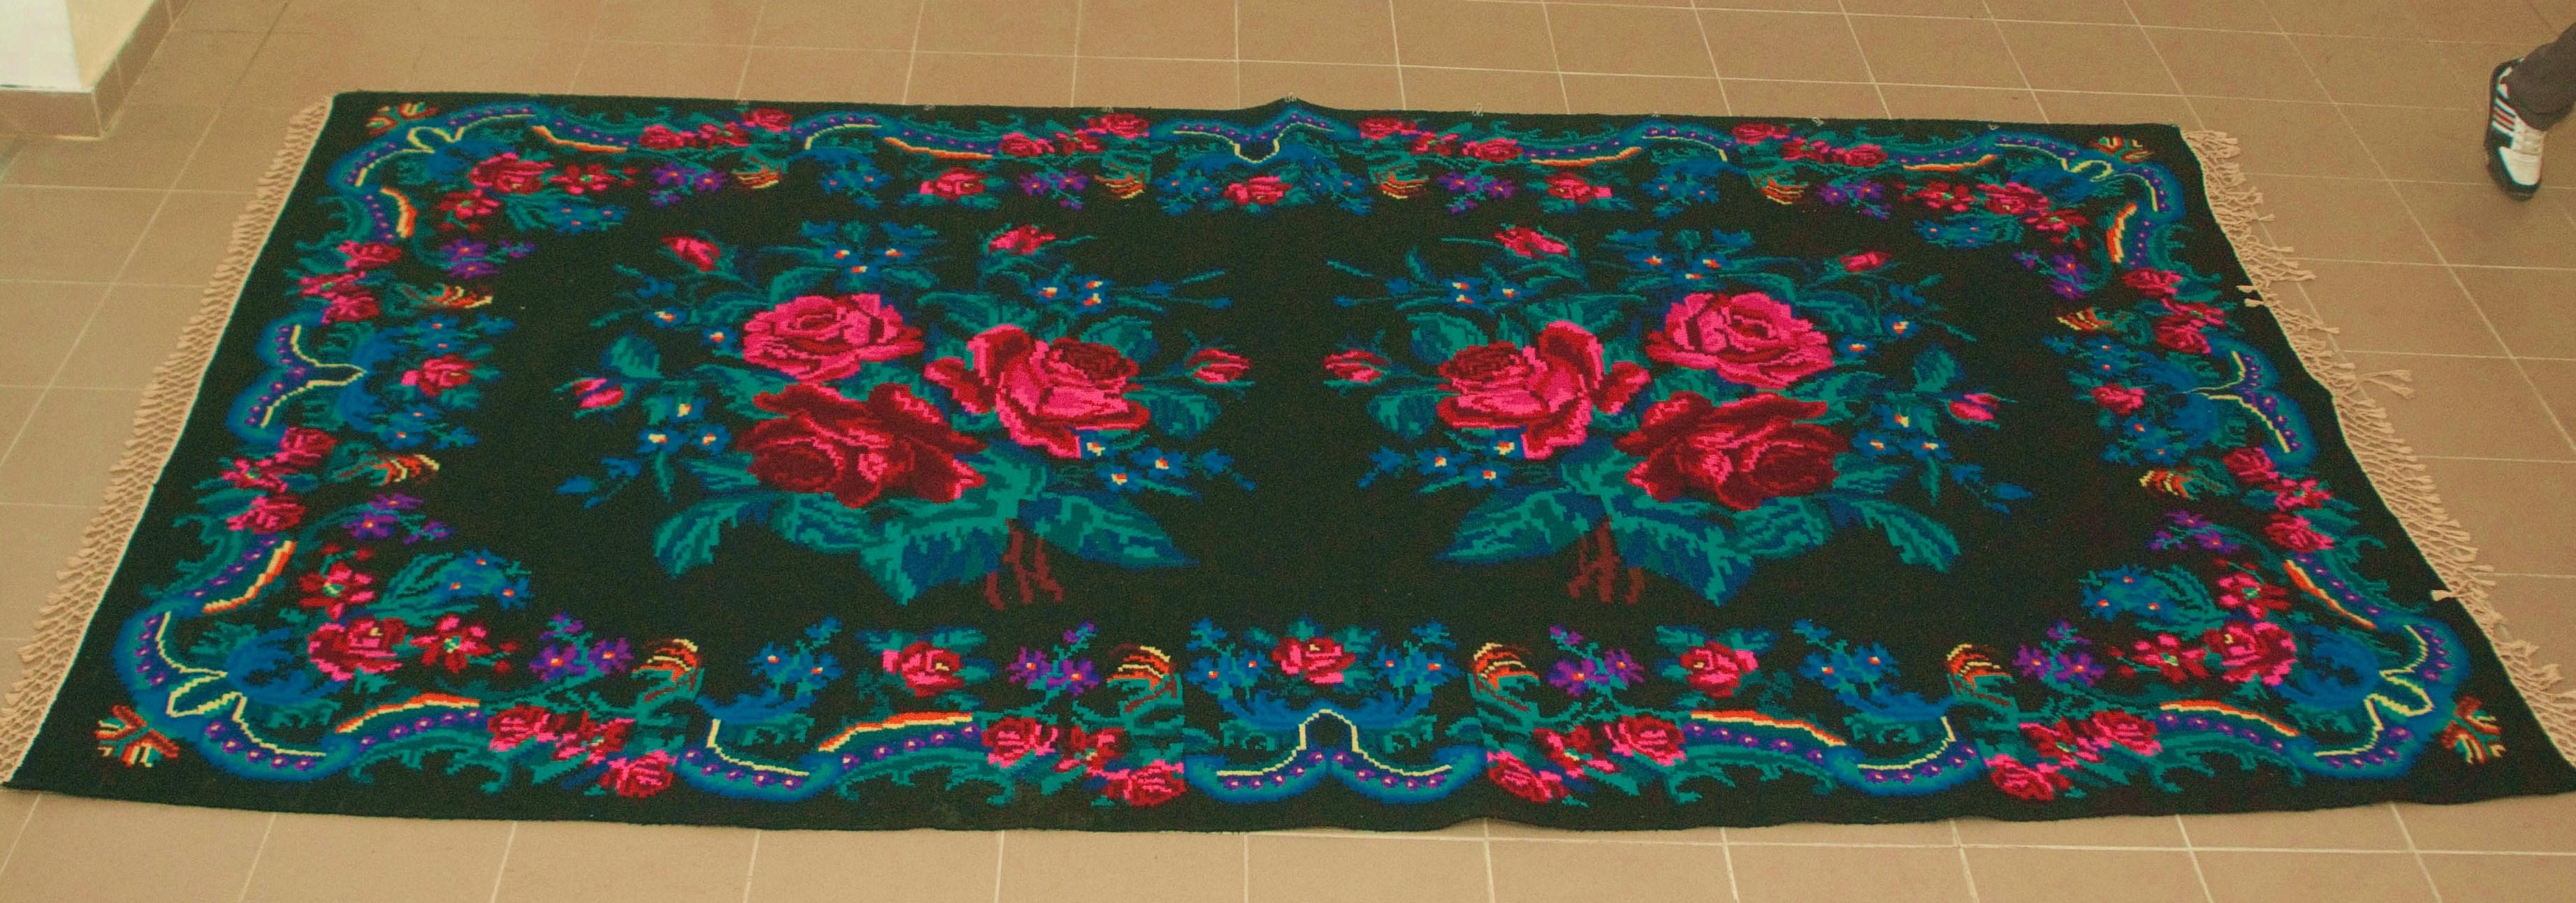 Unieke oude rozenkelim nr 0293 (191cm x 335cm) Kelim wordt begin oktober in Nederland verwacht